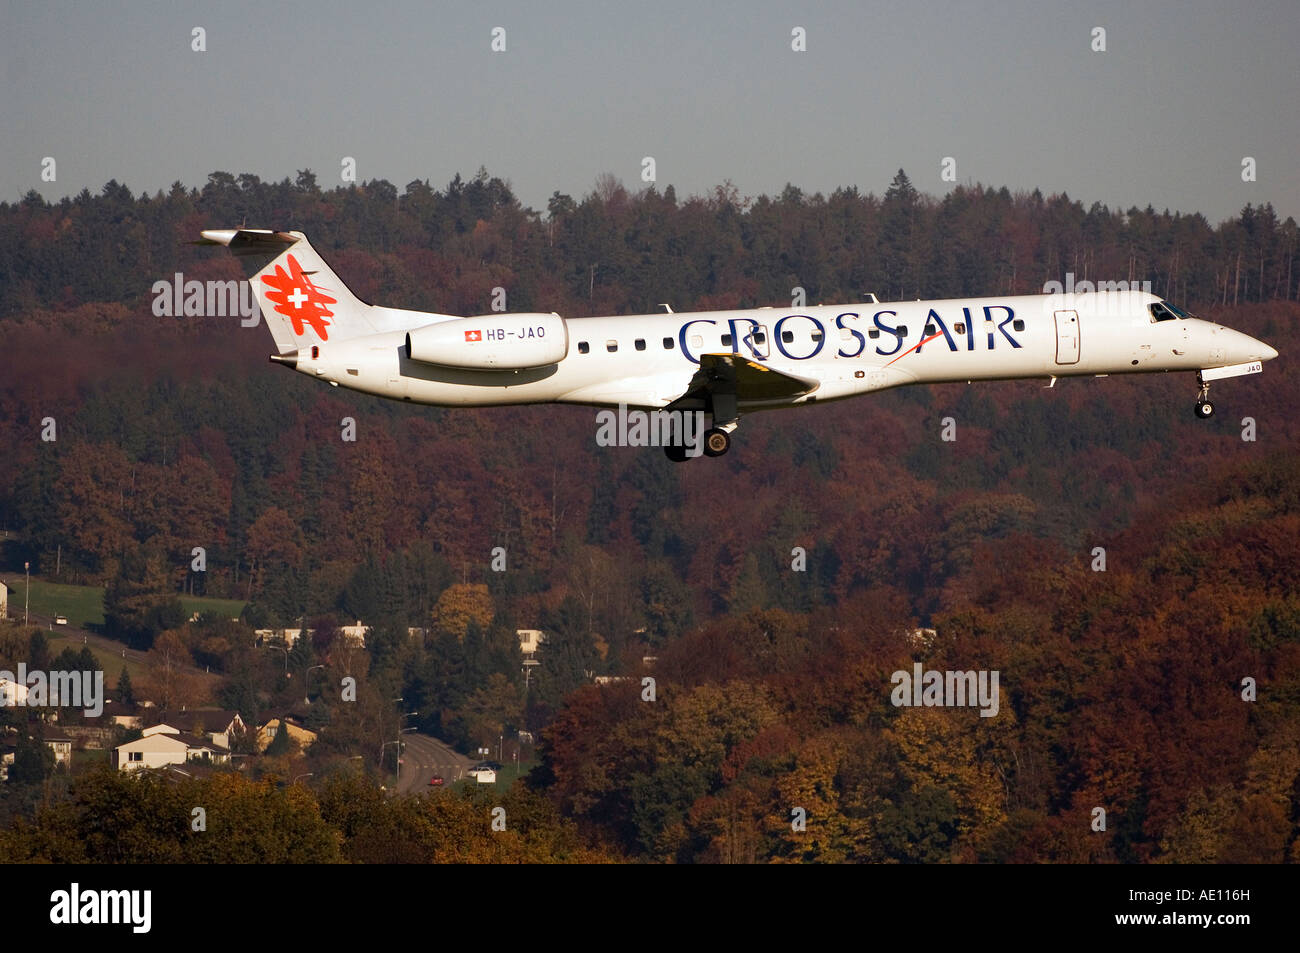 A Crossair plane landing at the airport in Zurich, Switzerland - Stock Image